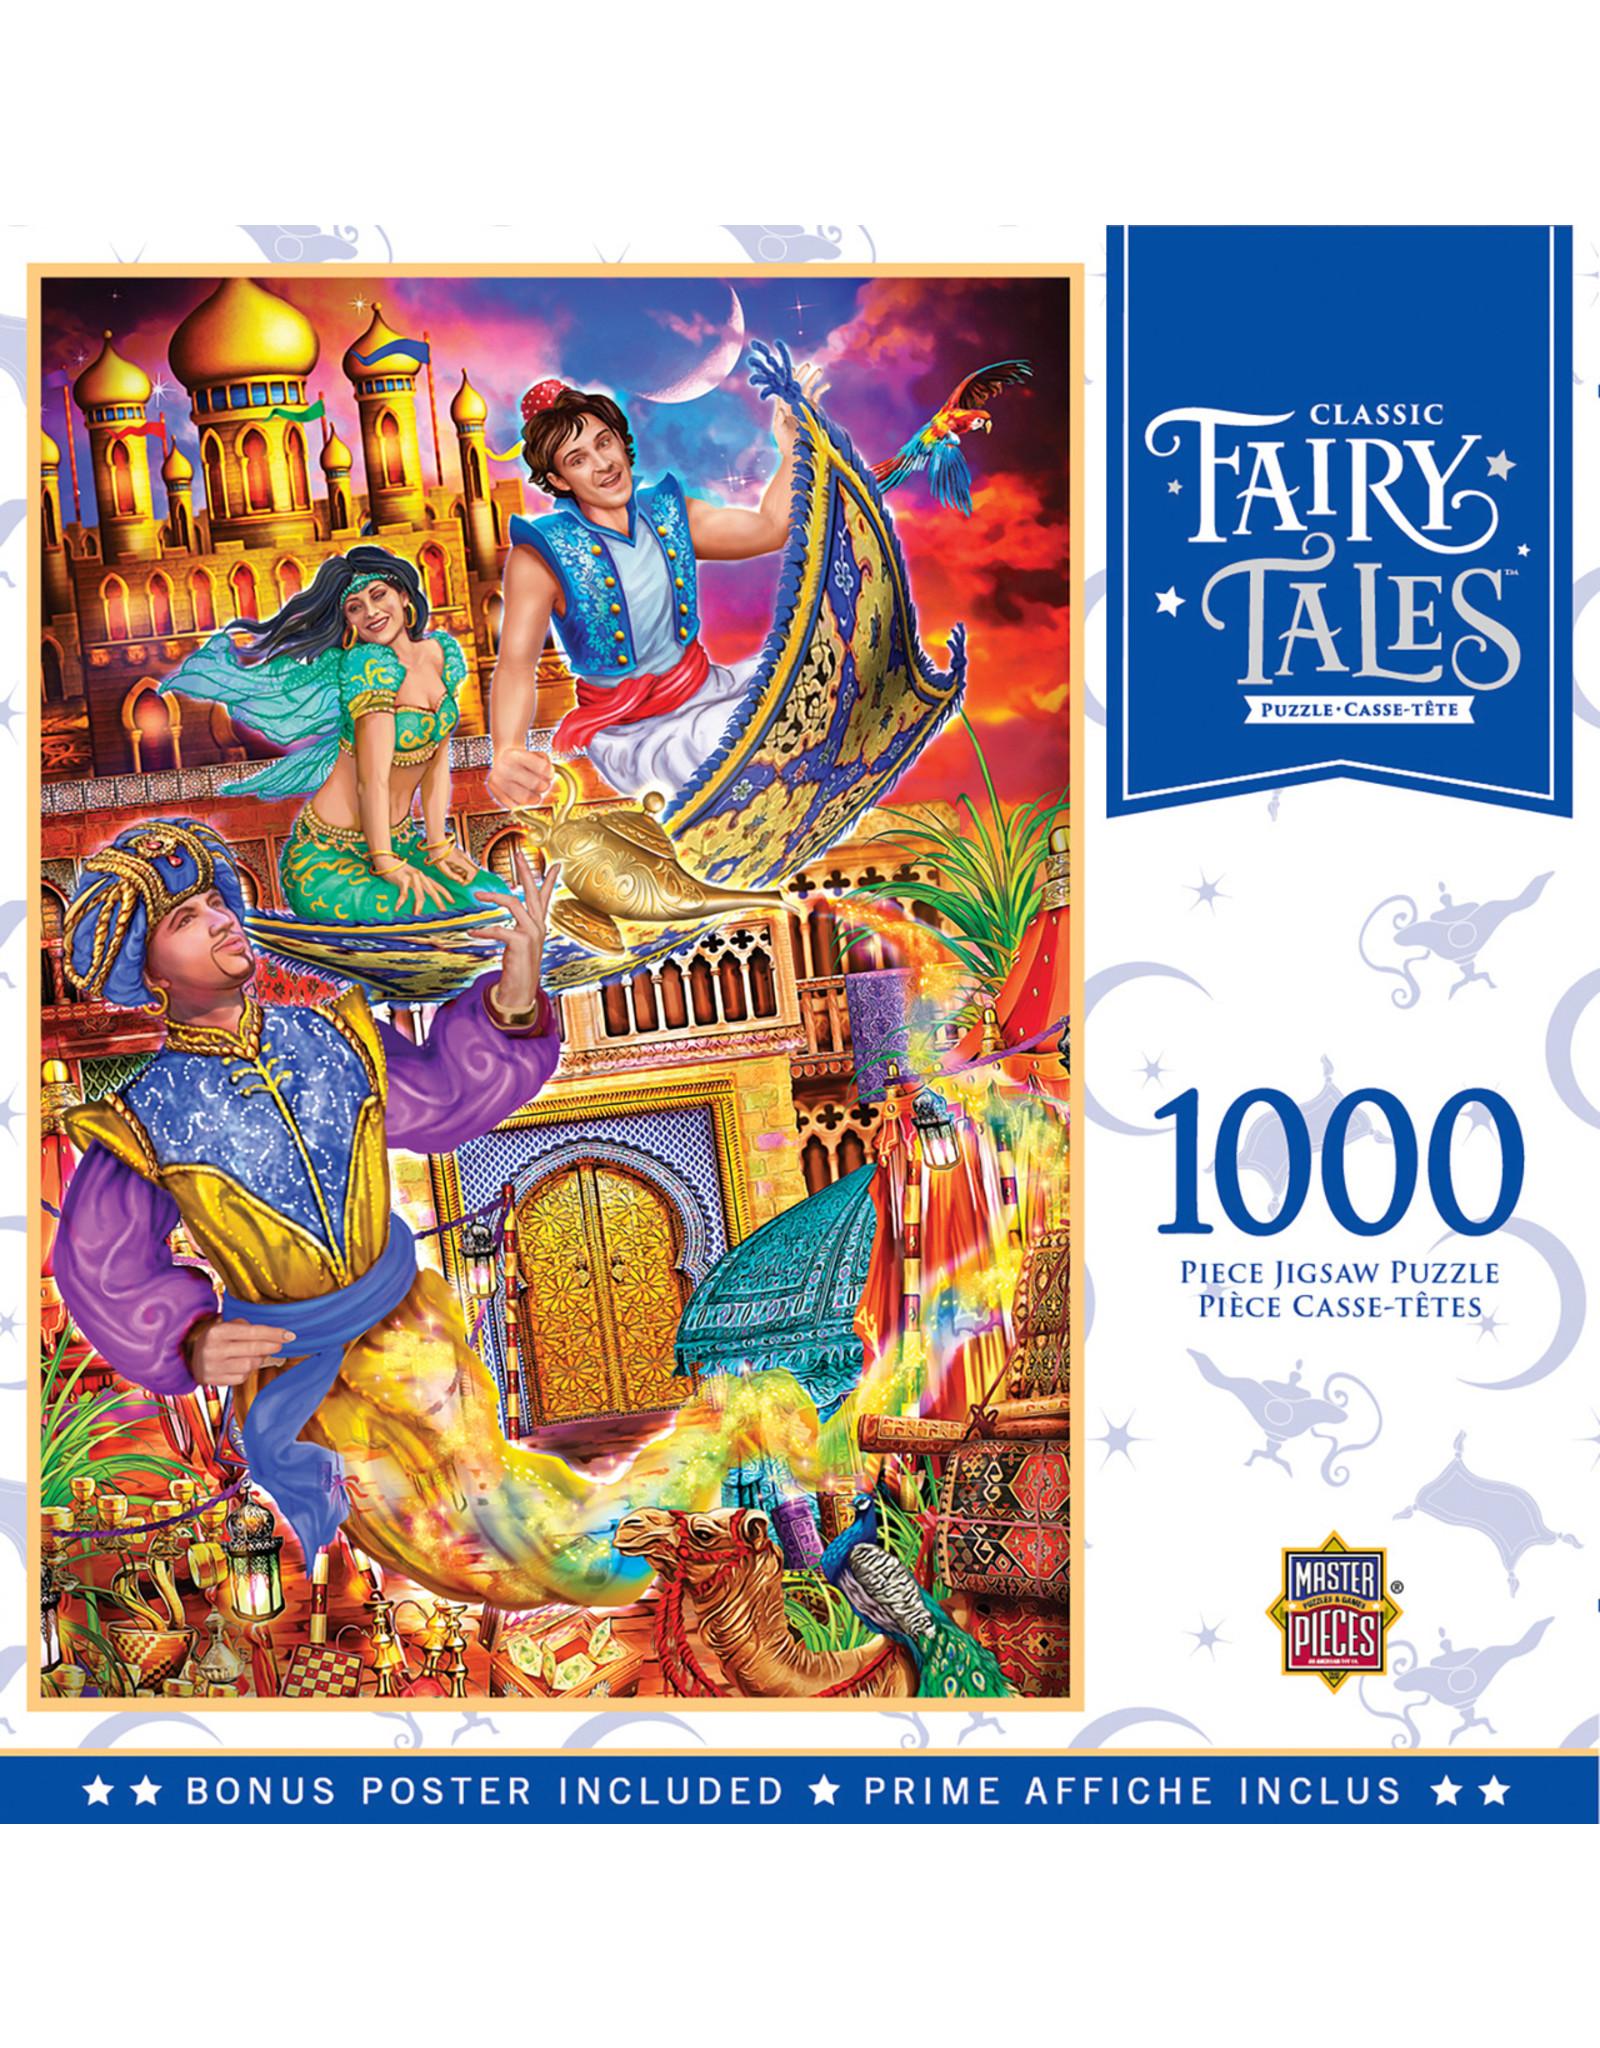 CLASSIC FAIRY TALES ALADDIN 1000 PIECE PUZZLE